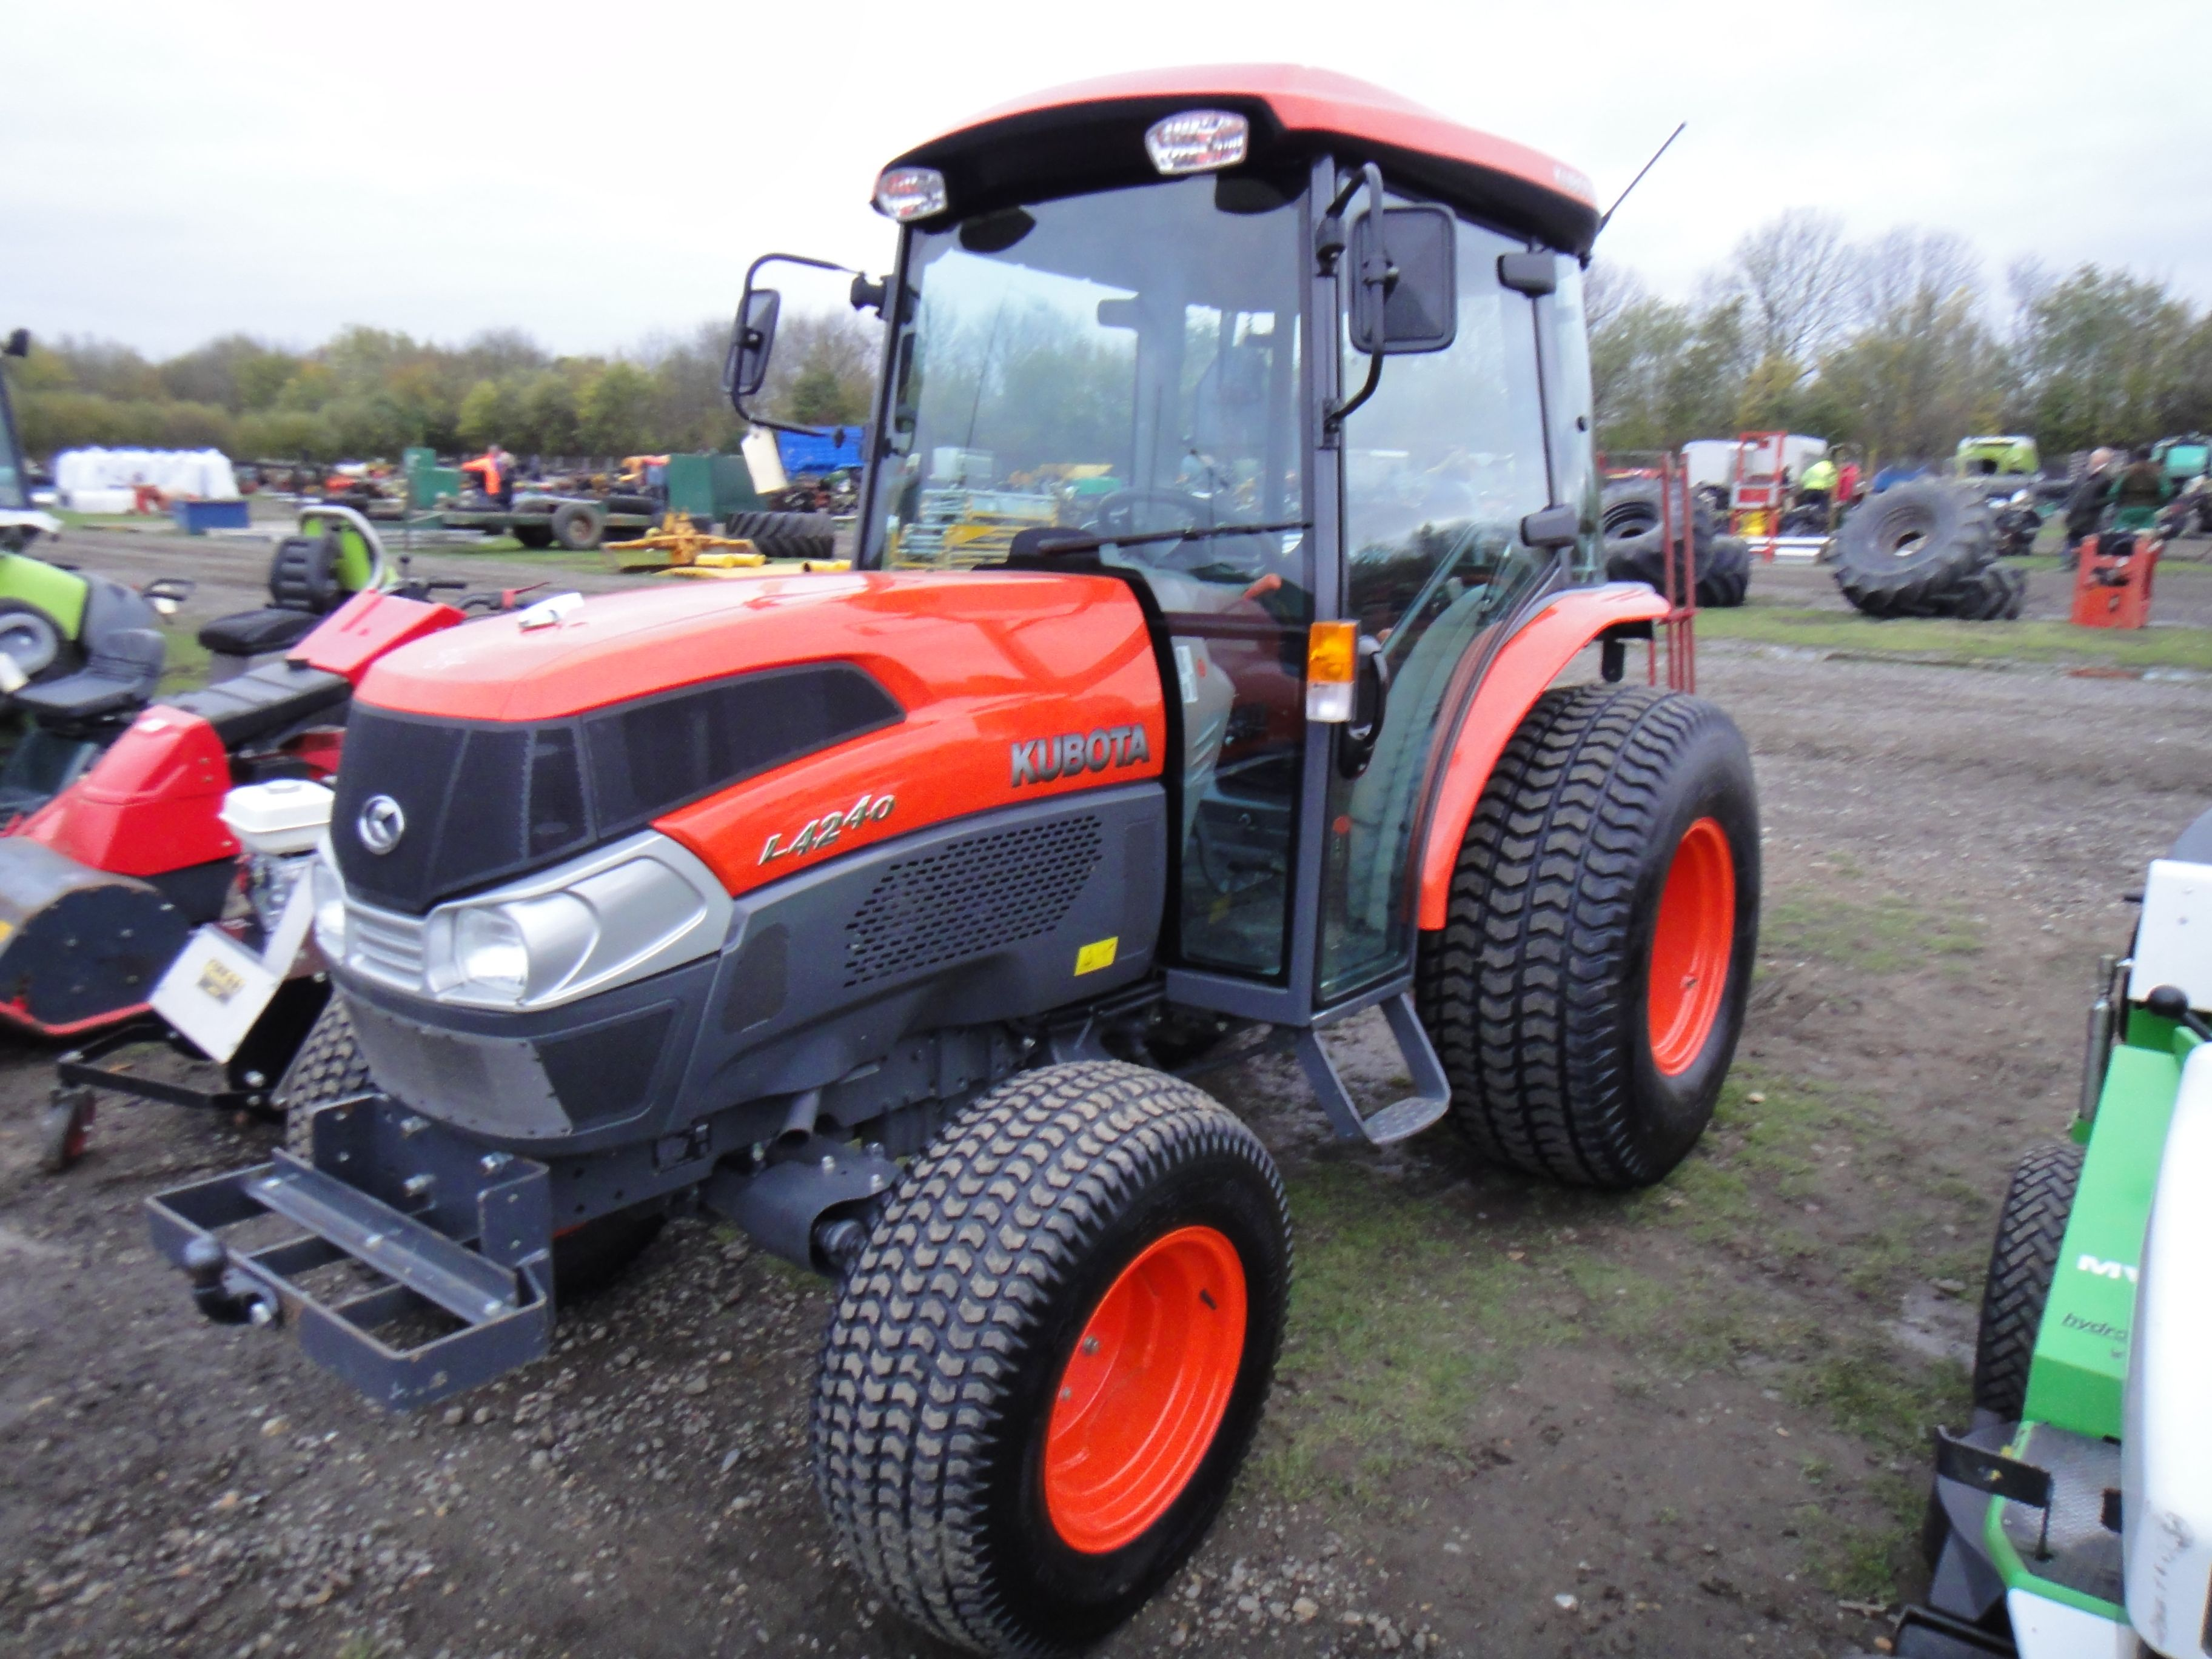 #kubota Tractor Dealers, White Tractor, Kubota Tractors, Farming, Manual,  Catalog